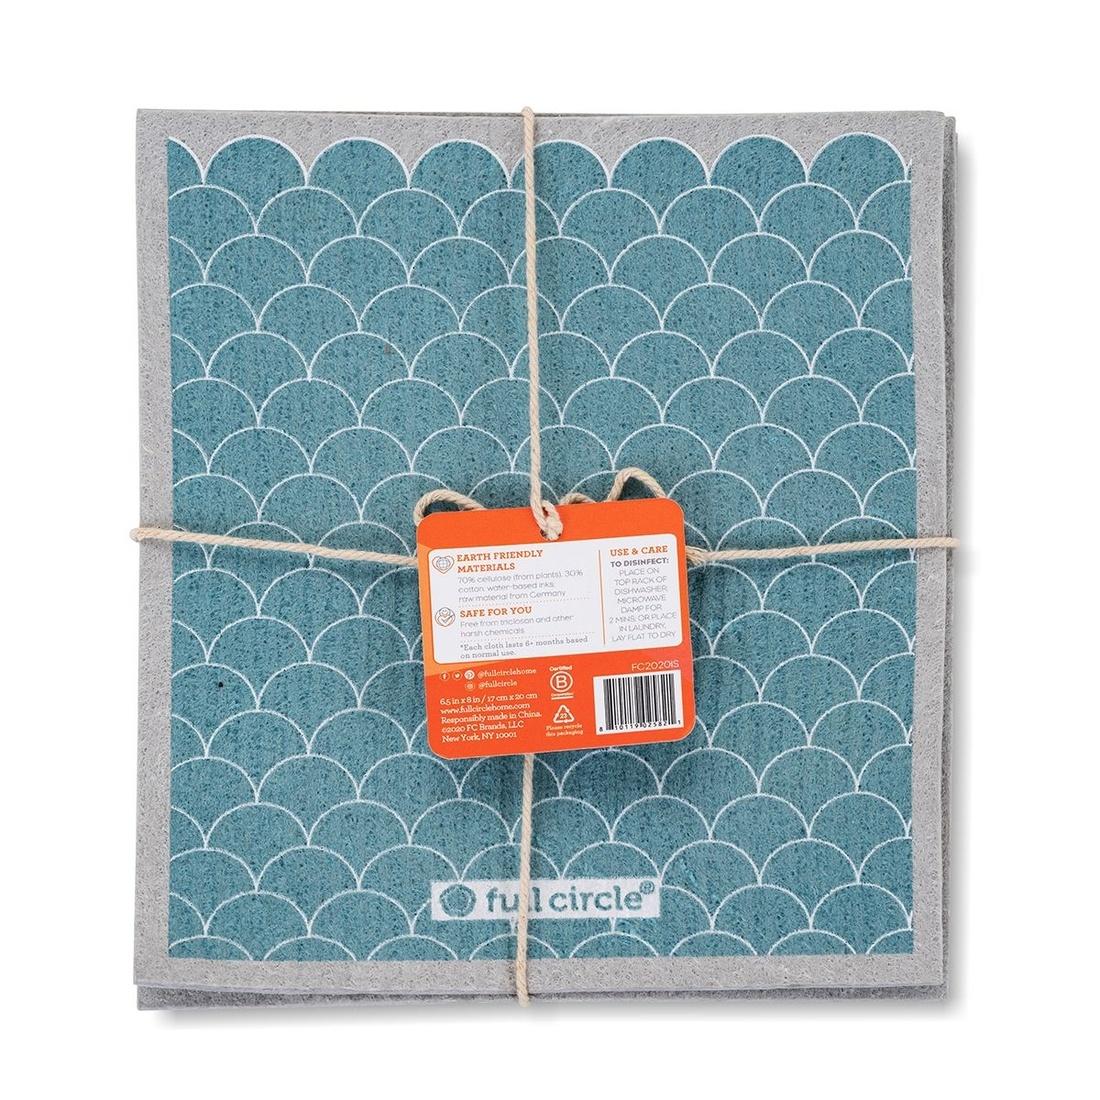 Full Circle Home Good Sheet Plant-Based Dishcloths (3Pk)